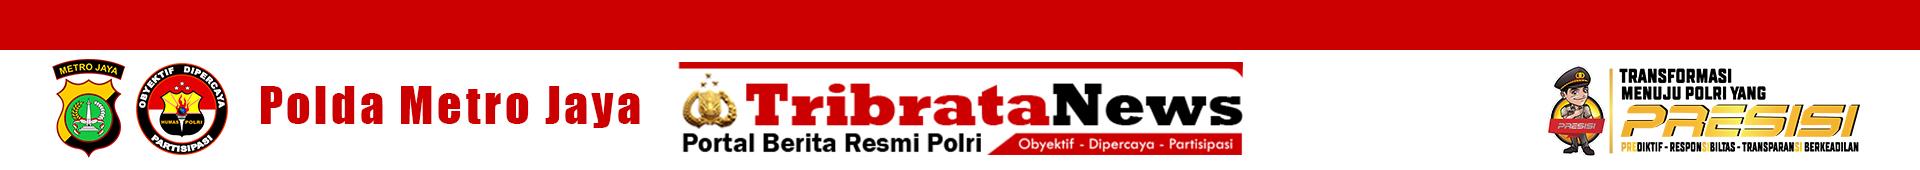 Tribrata News